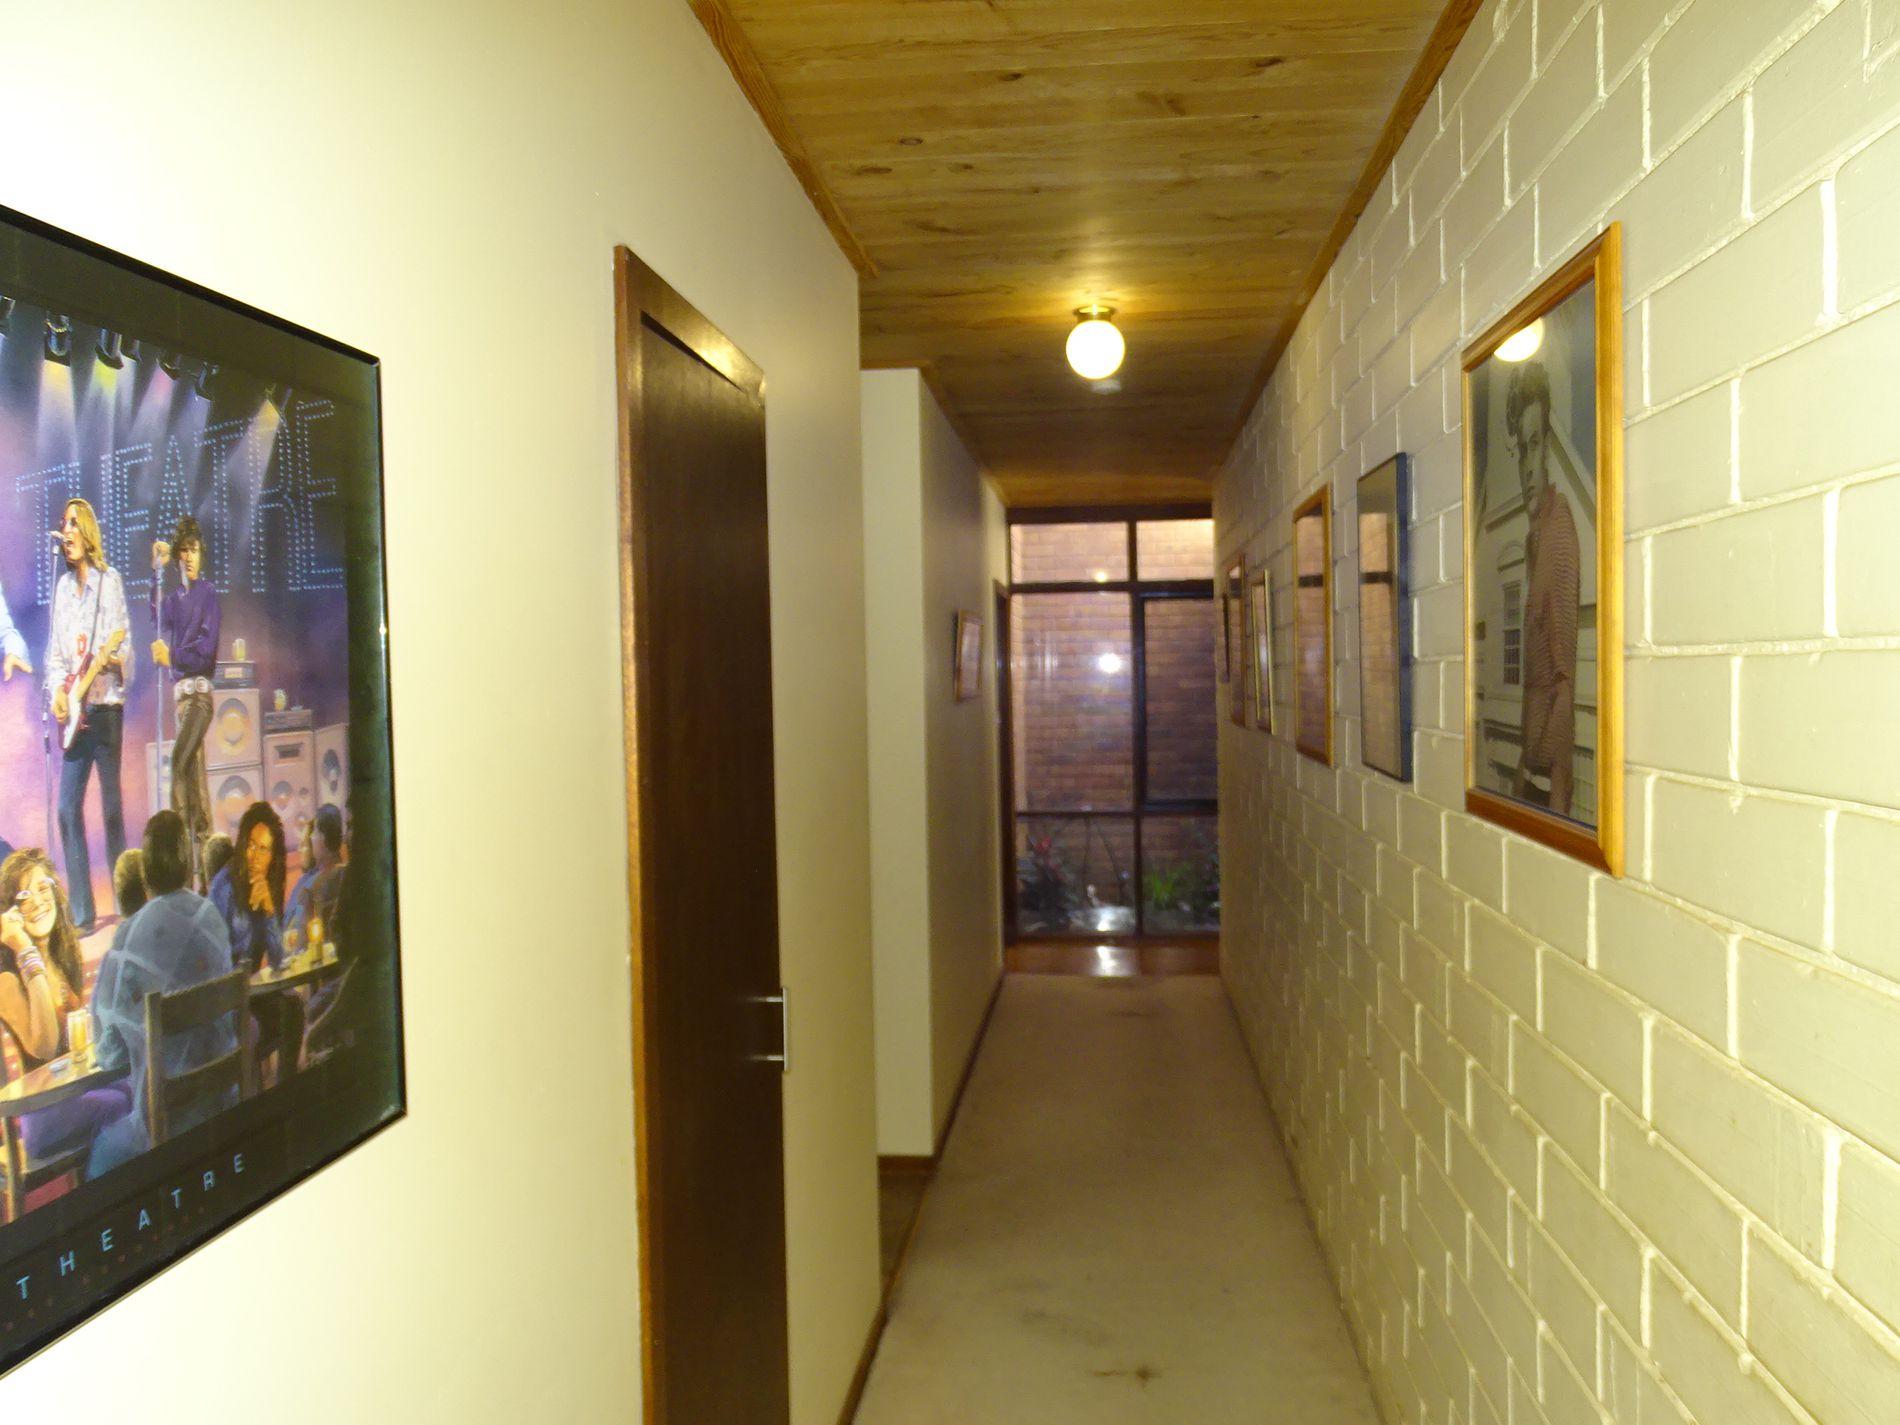 1275 Merrigum - Ardmona Road, Ardmona